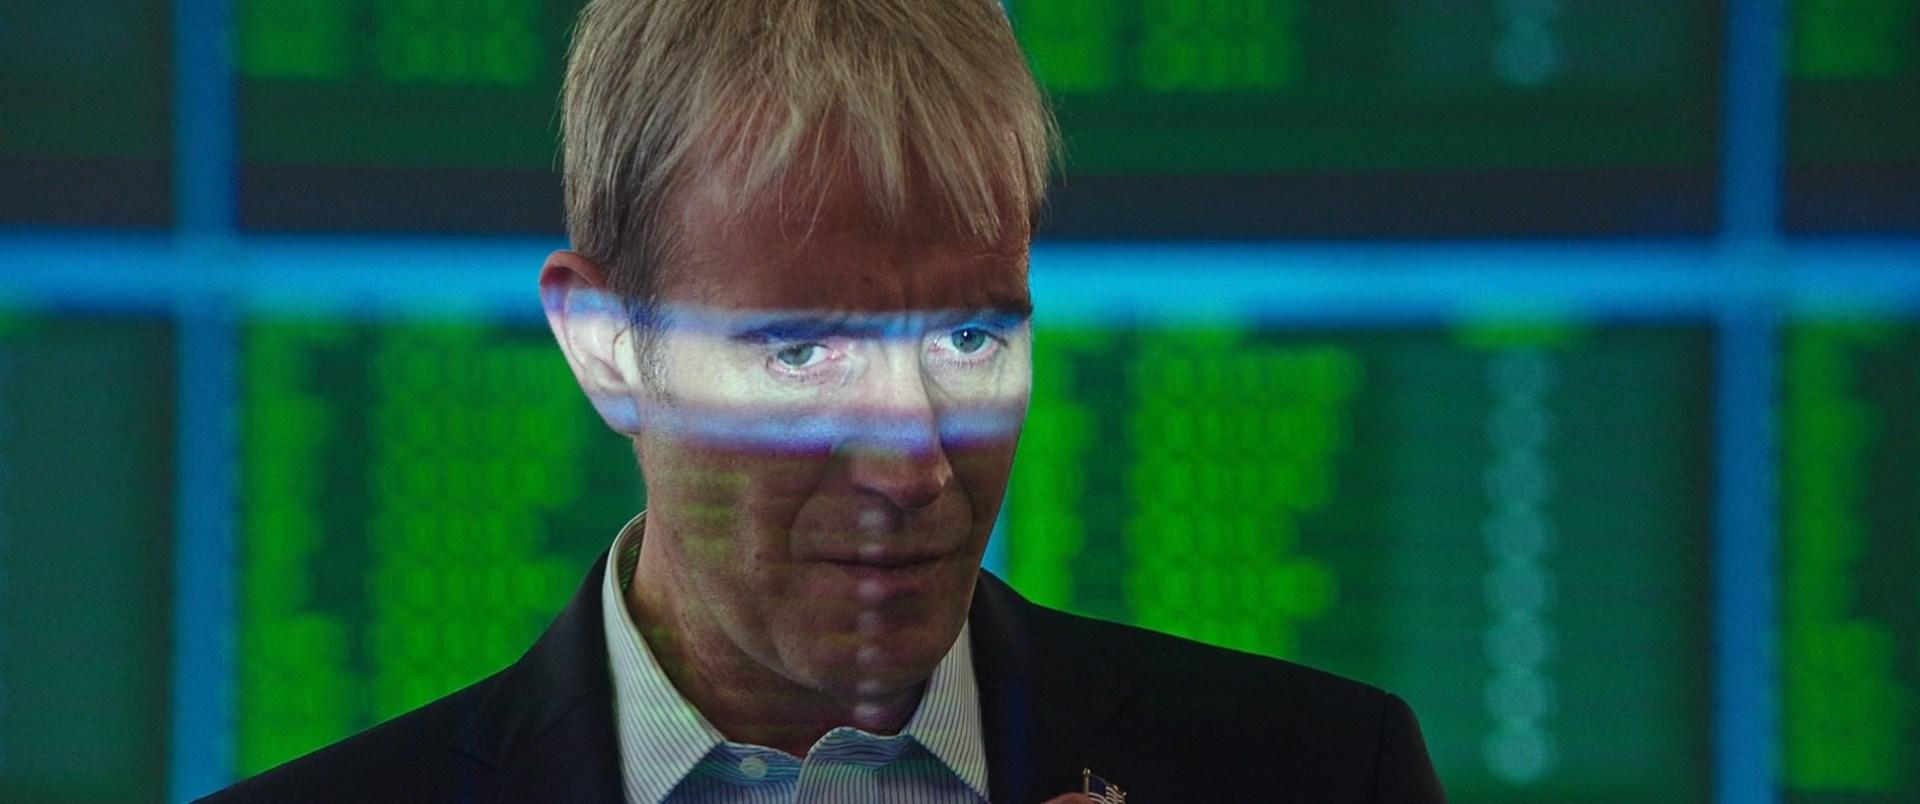 NSA-executives-Snowden-Movie.jpg